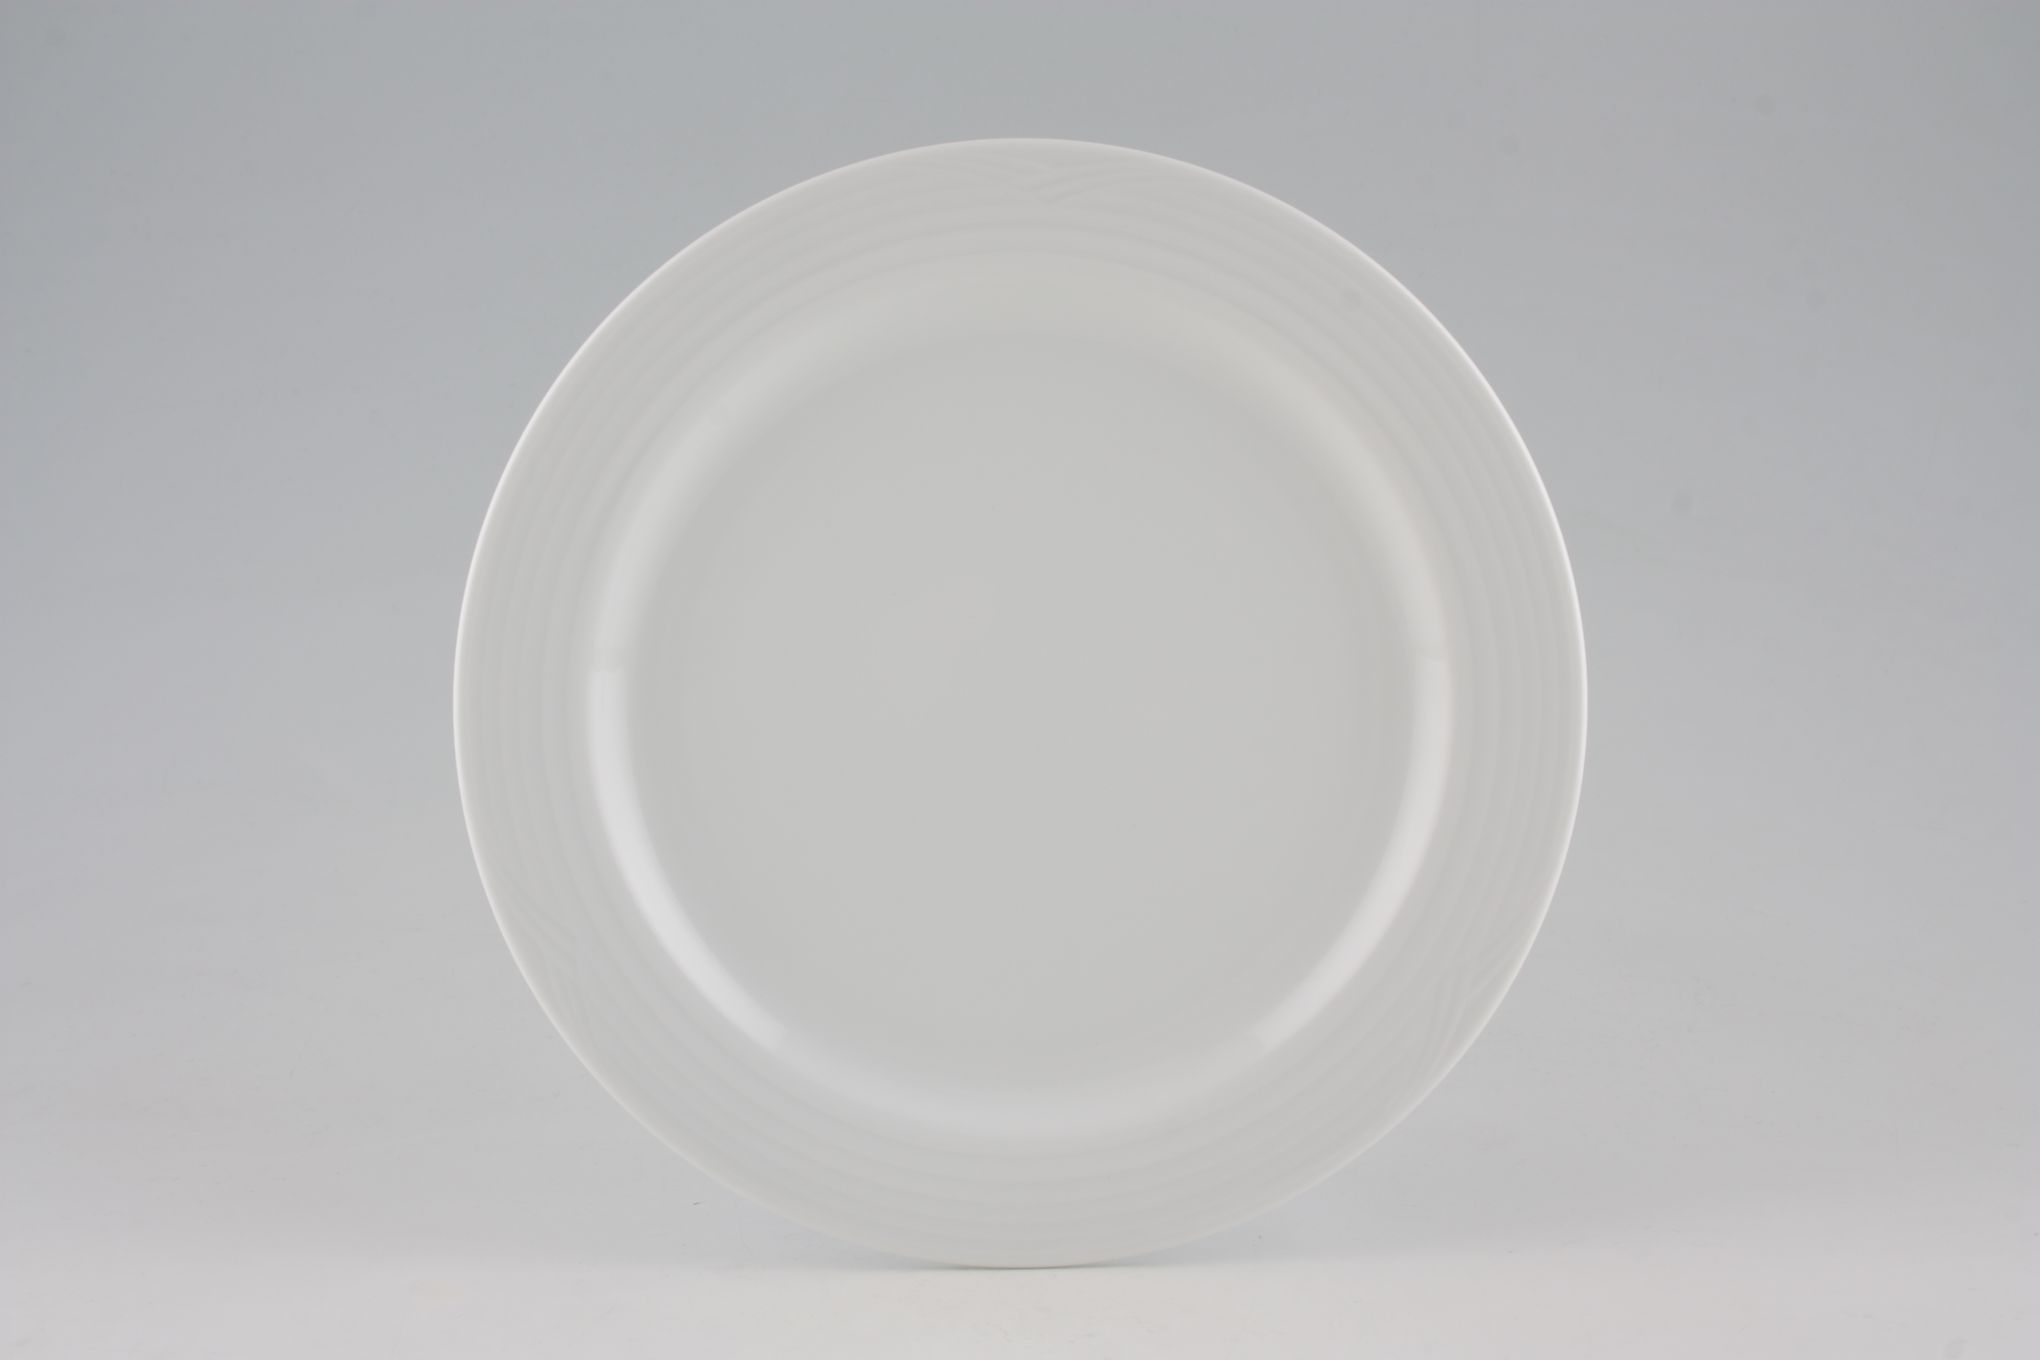 Noritake Arctic White Starter / Salad / Dessert Plate 21.3cm thumb 2